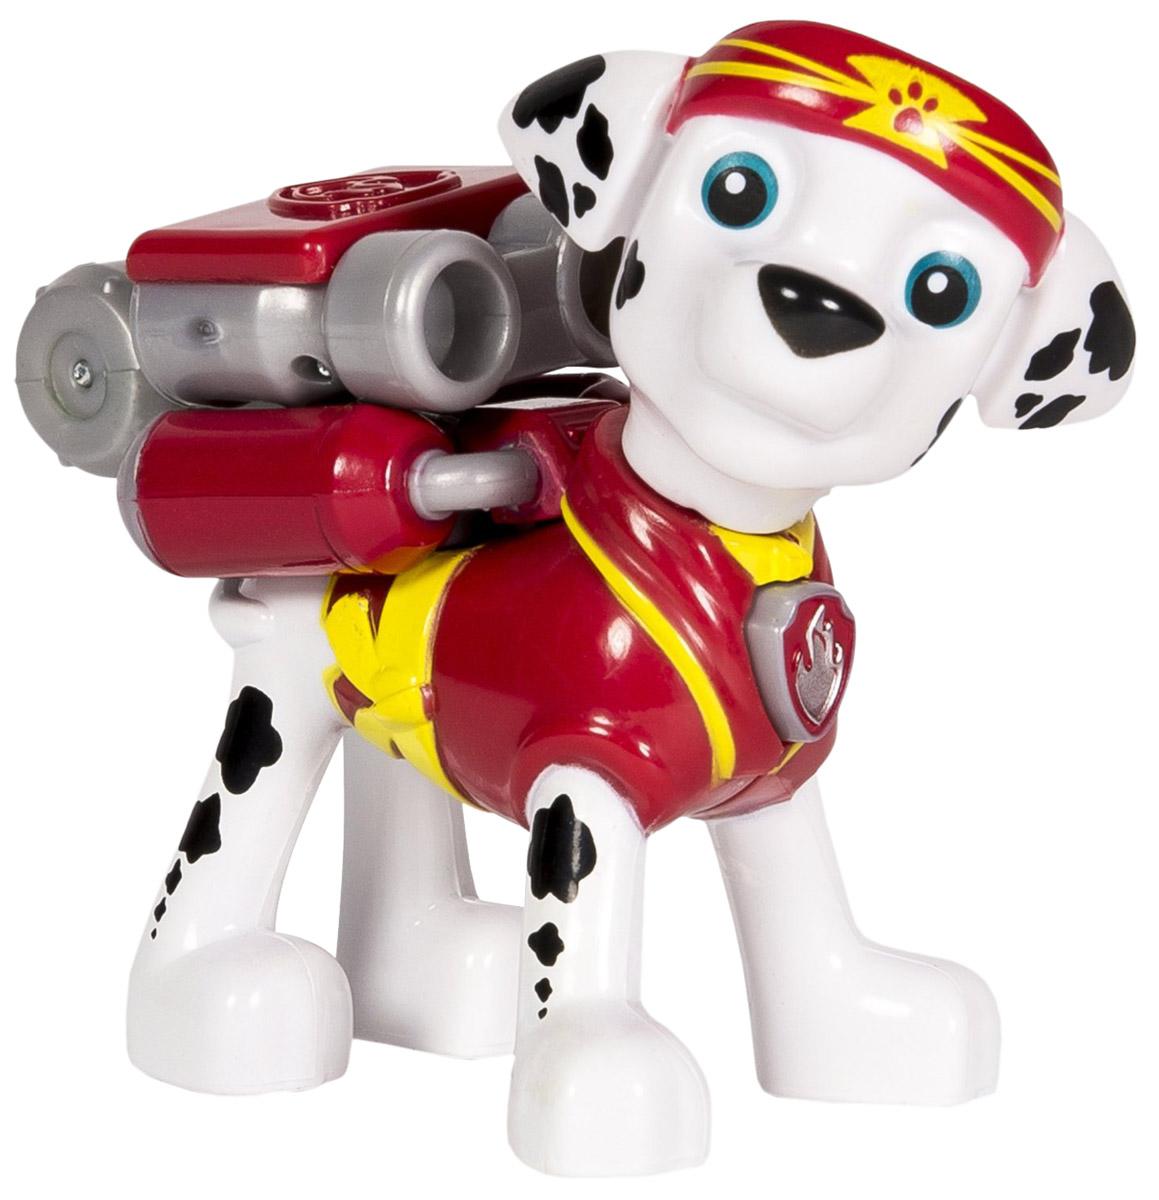 Paw Patrol Фигурка Marshall с рюкзаком-трансформером paw patrol фигурка щенок спасатель marshall